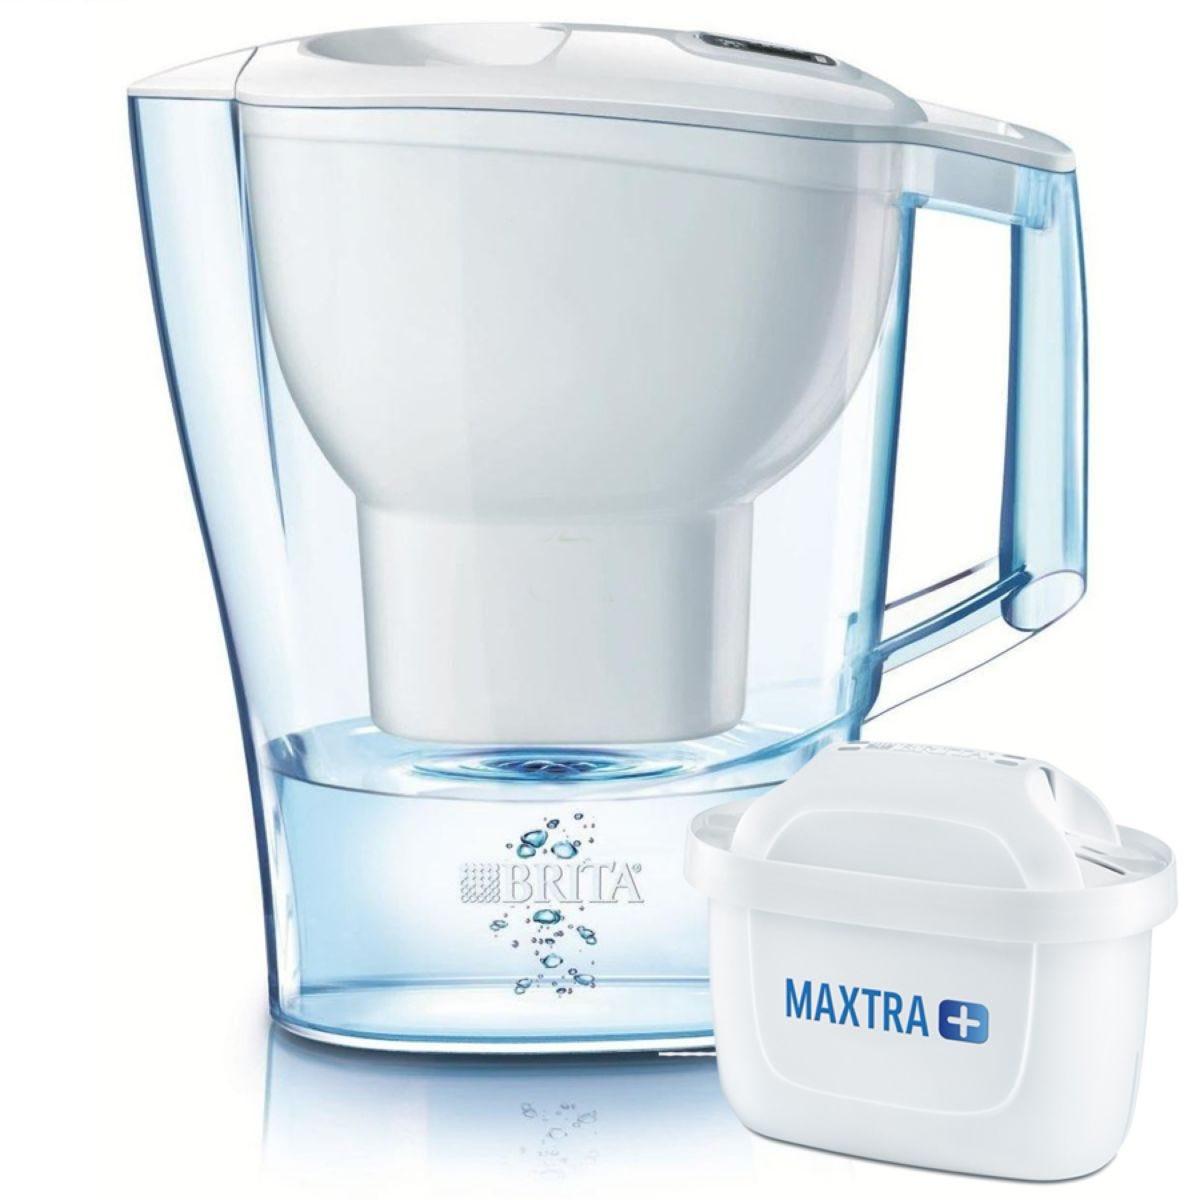 Brita Maxtra+ Aluna Cool Water Filter 2.4L Jug - White